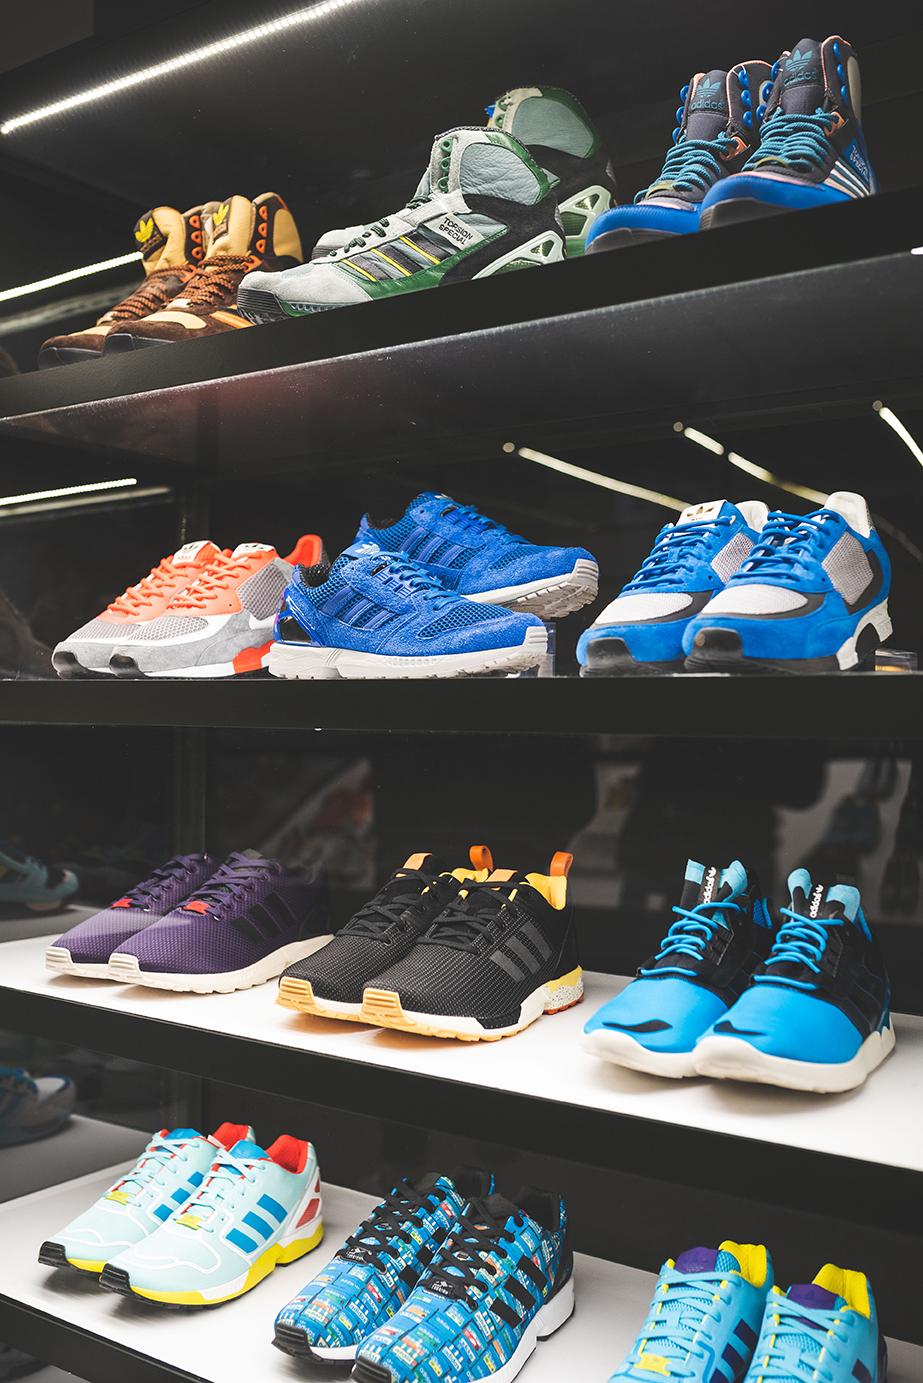 adidas_ZX_TheRootsOfRunningExhibition_London_22-11-18-18.jpg